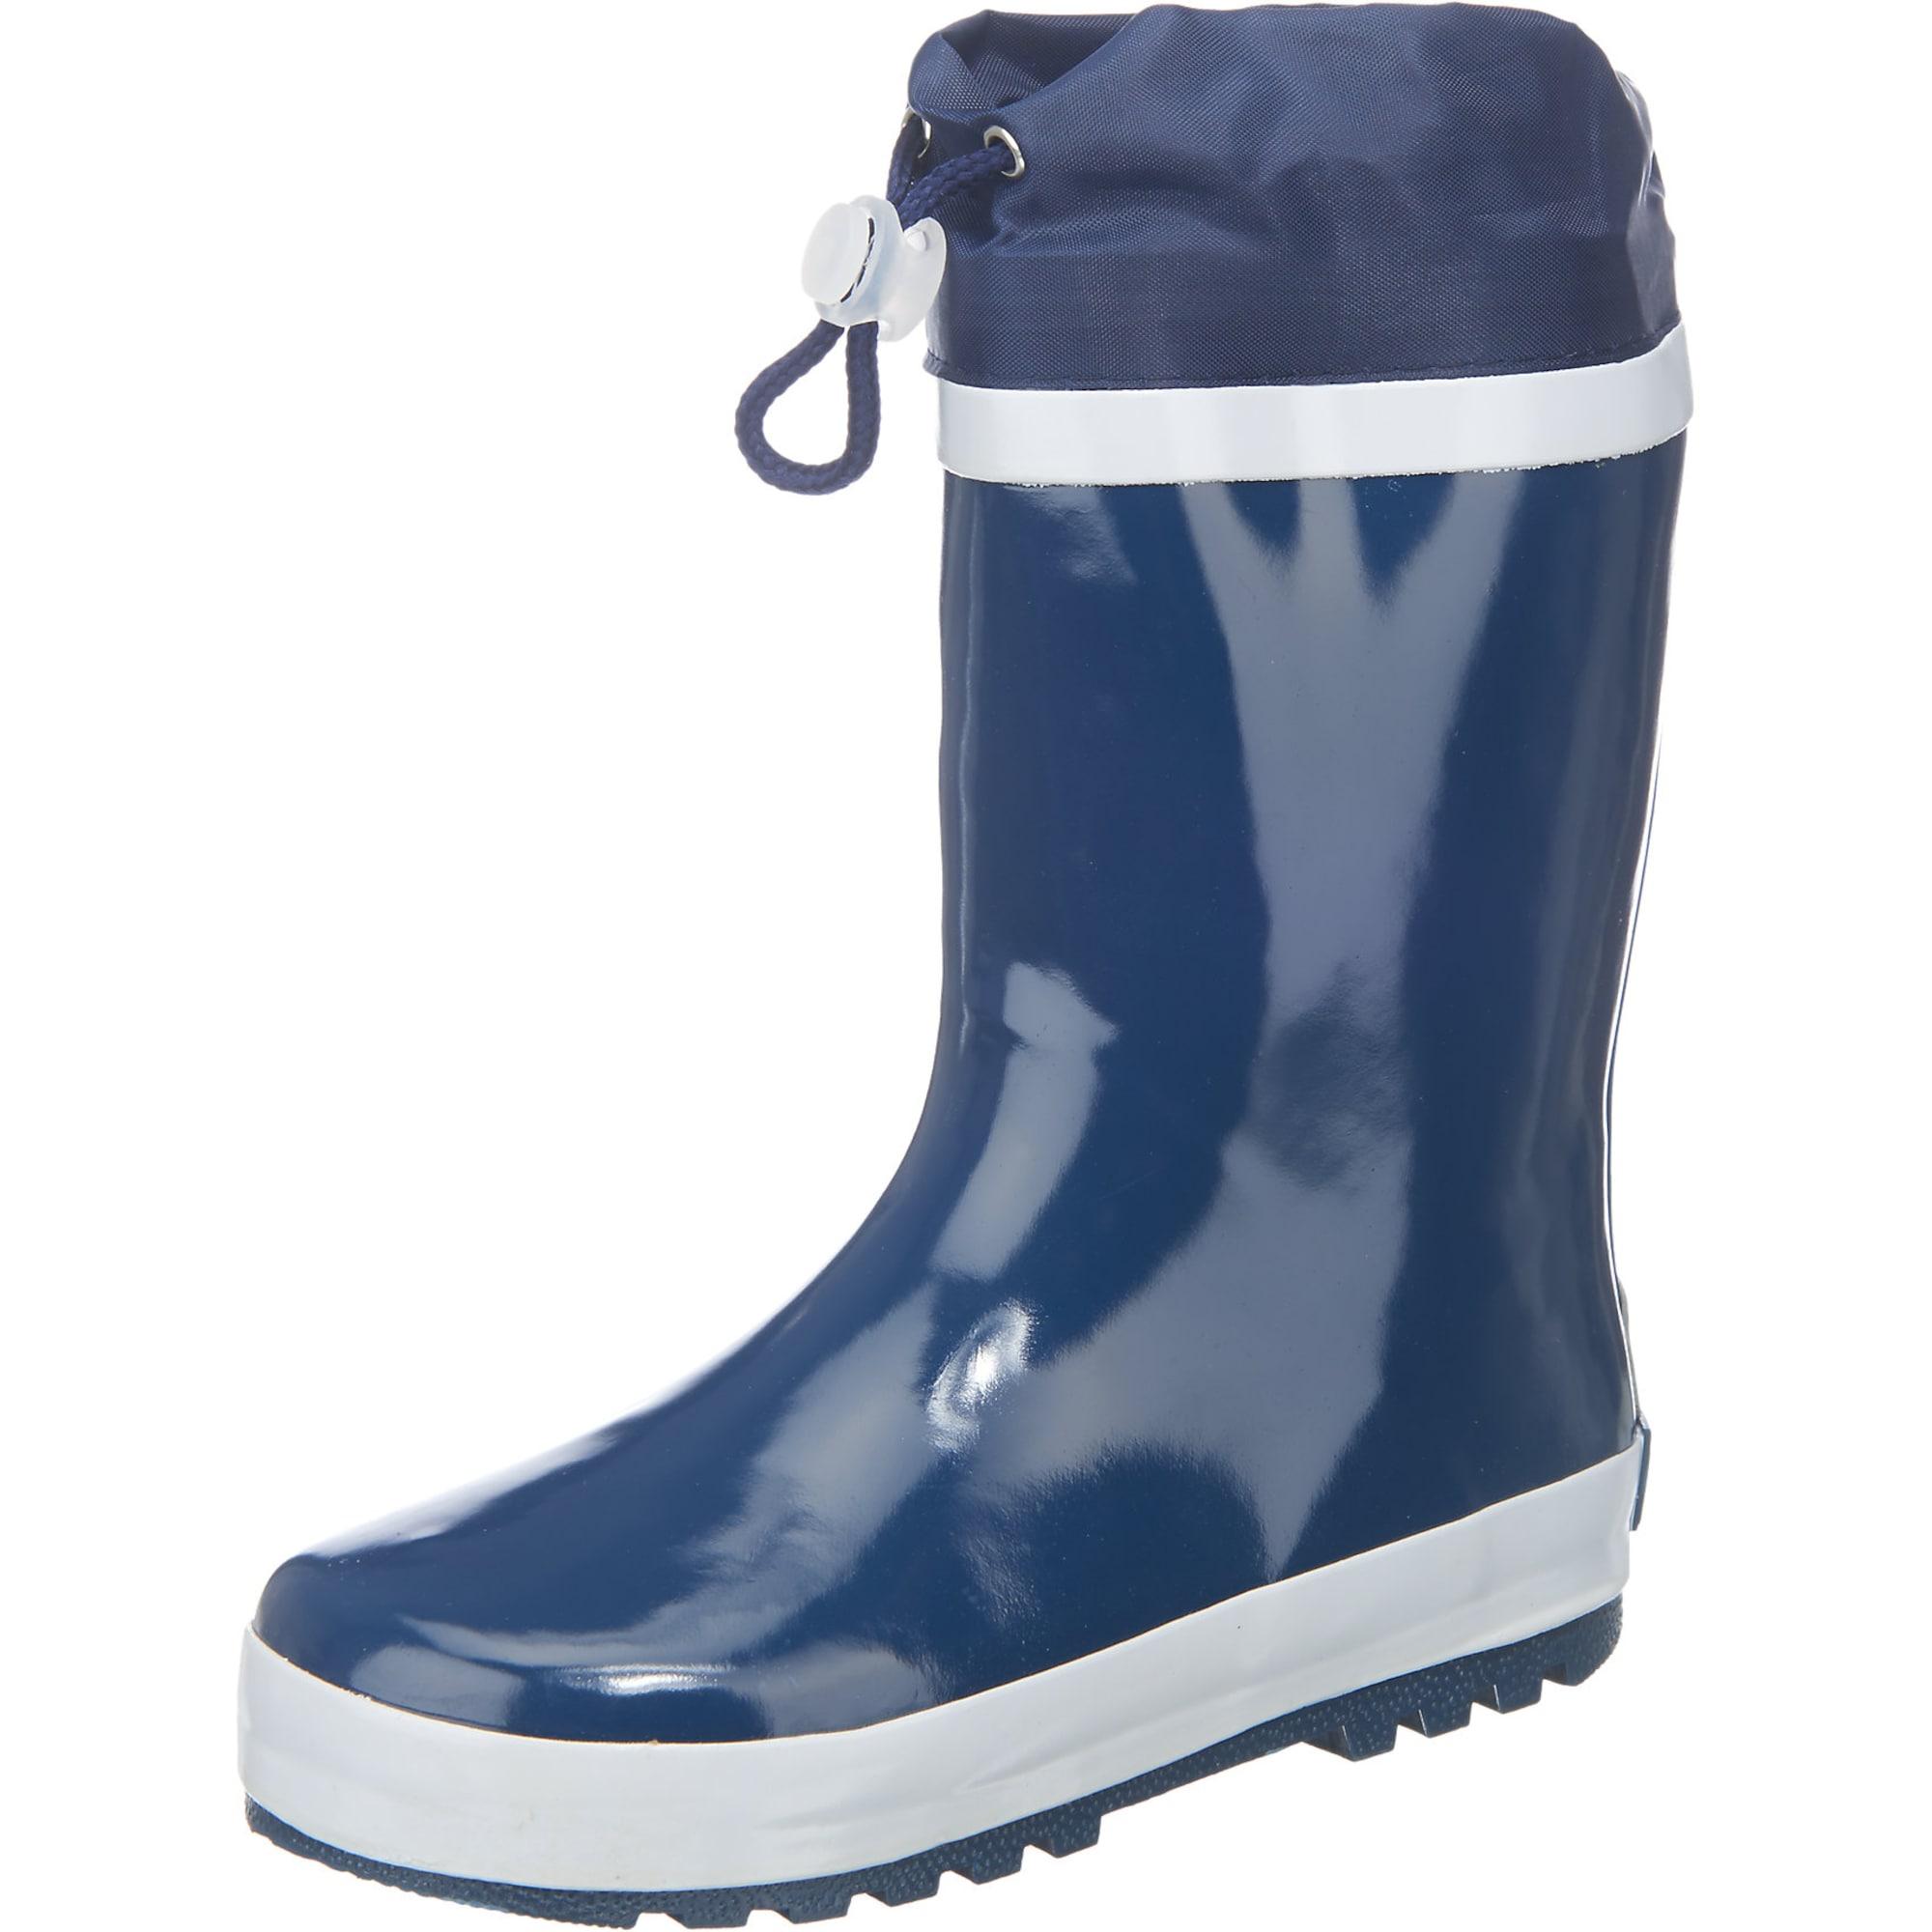 PLAYSHOES Guminiai batai balta / tamsiai mėlyna